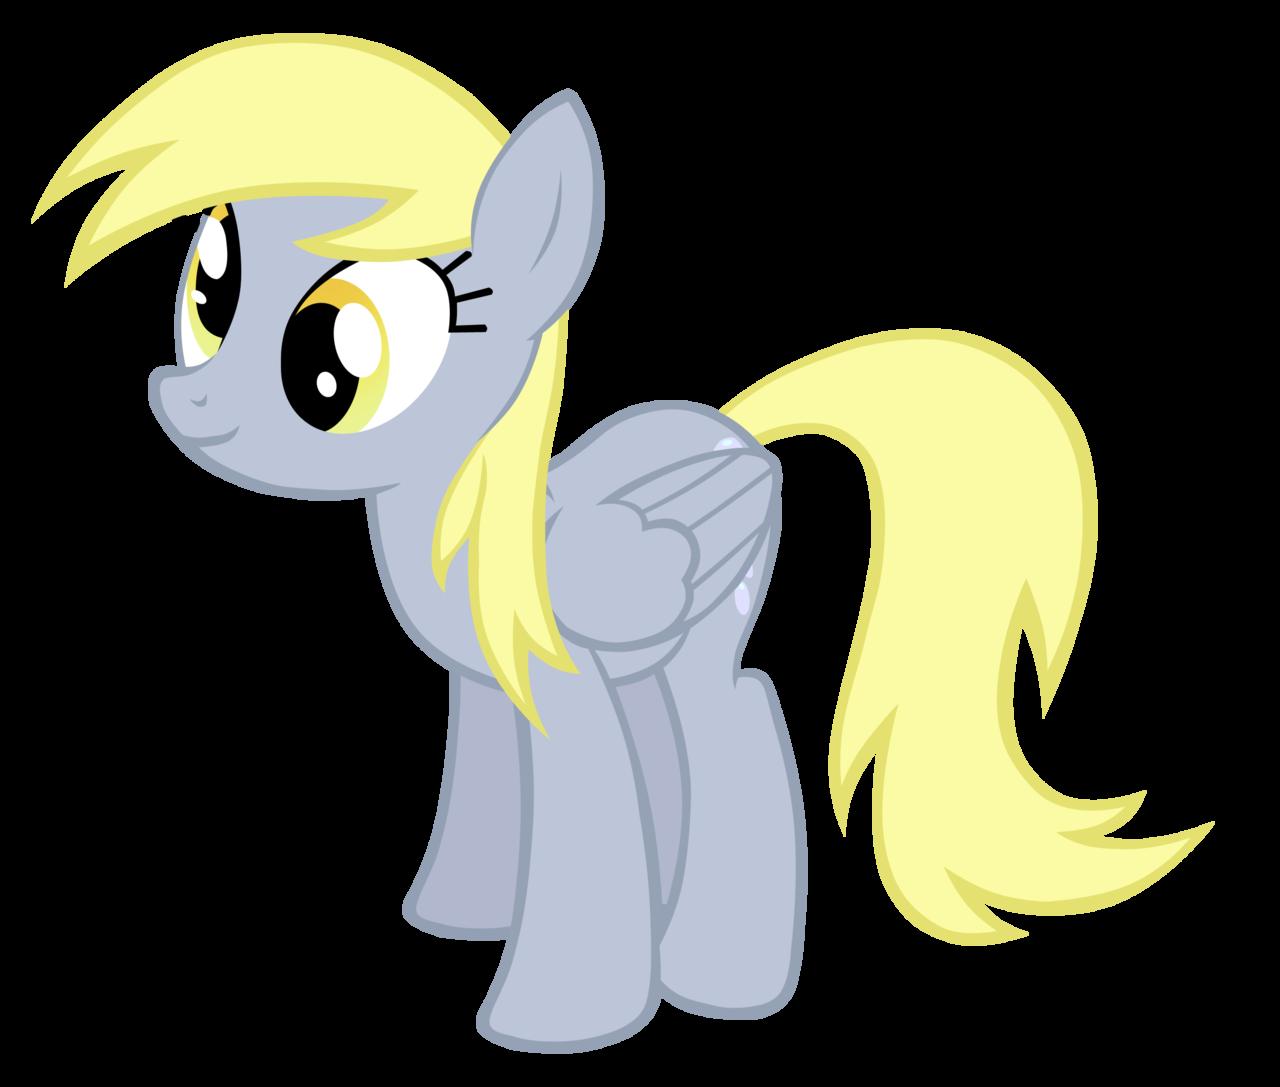 Derp. Derpy the pony.